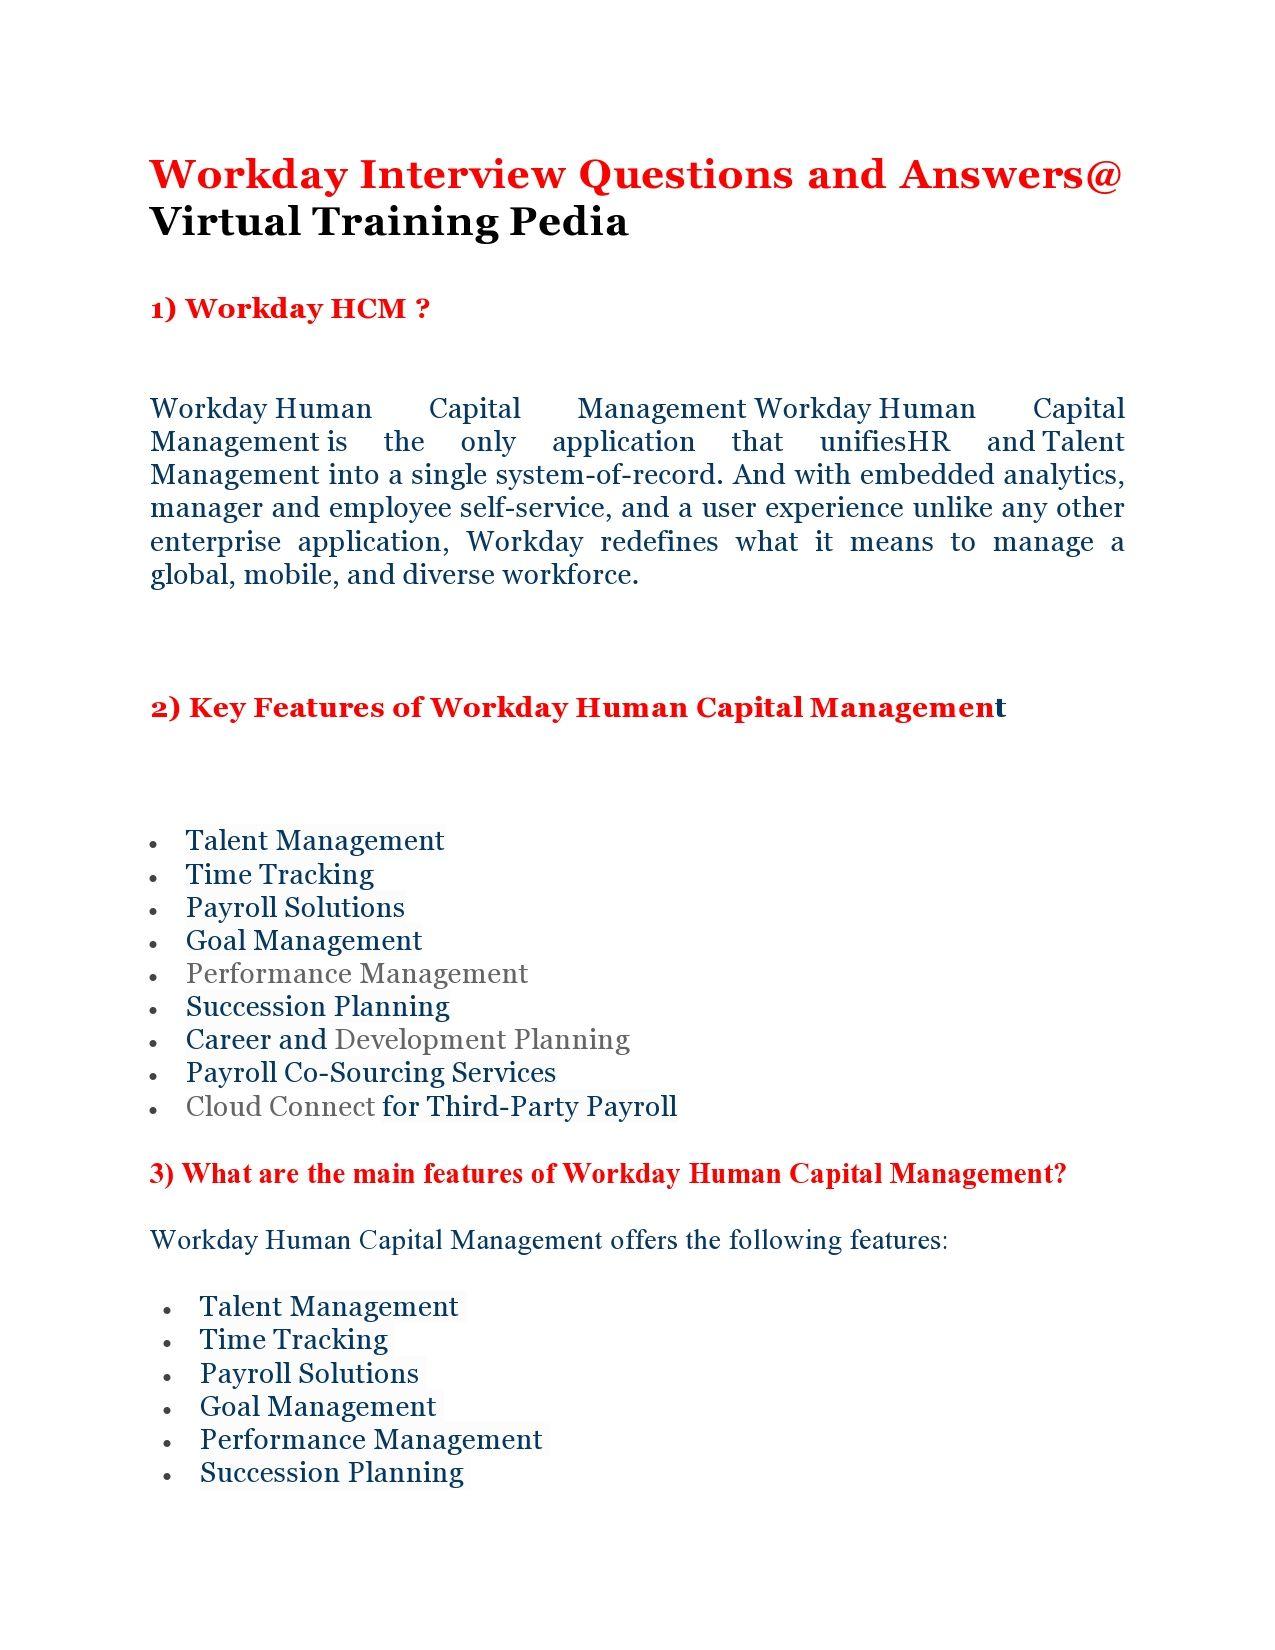 Workday Online Training (WorkdayVTP) on Pinterest